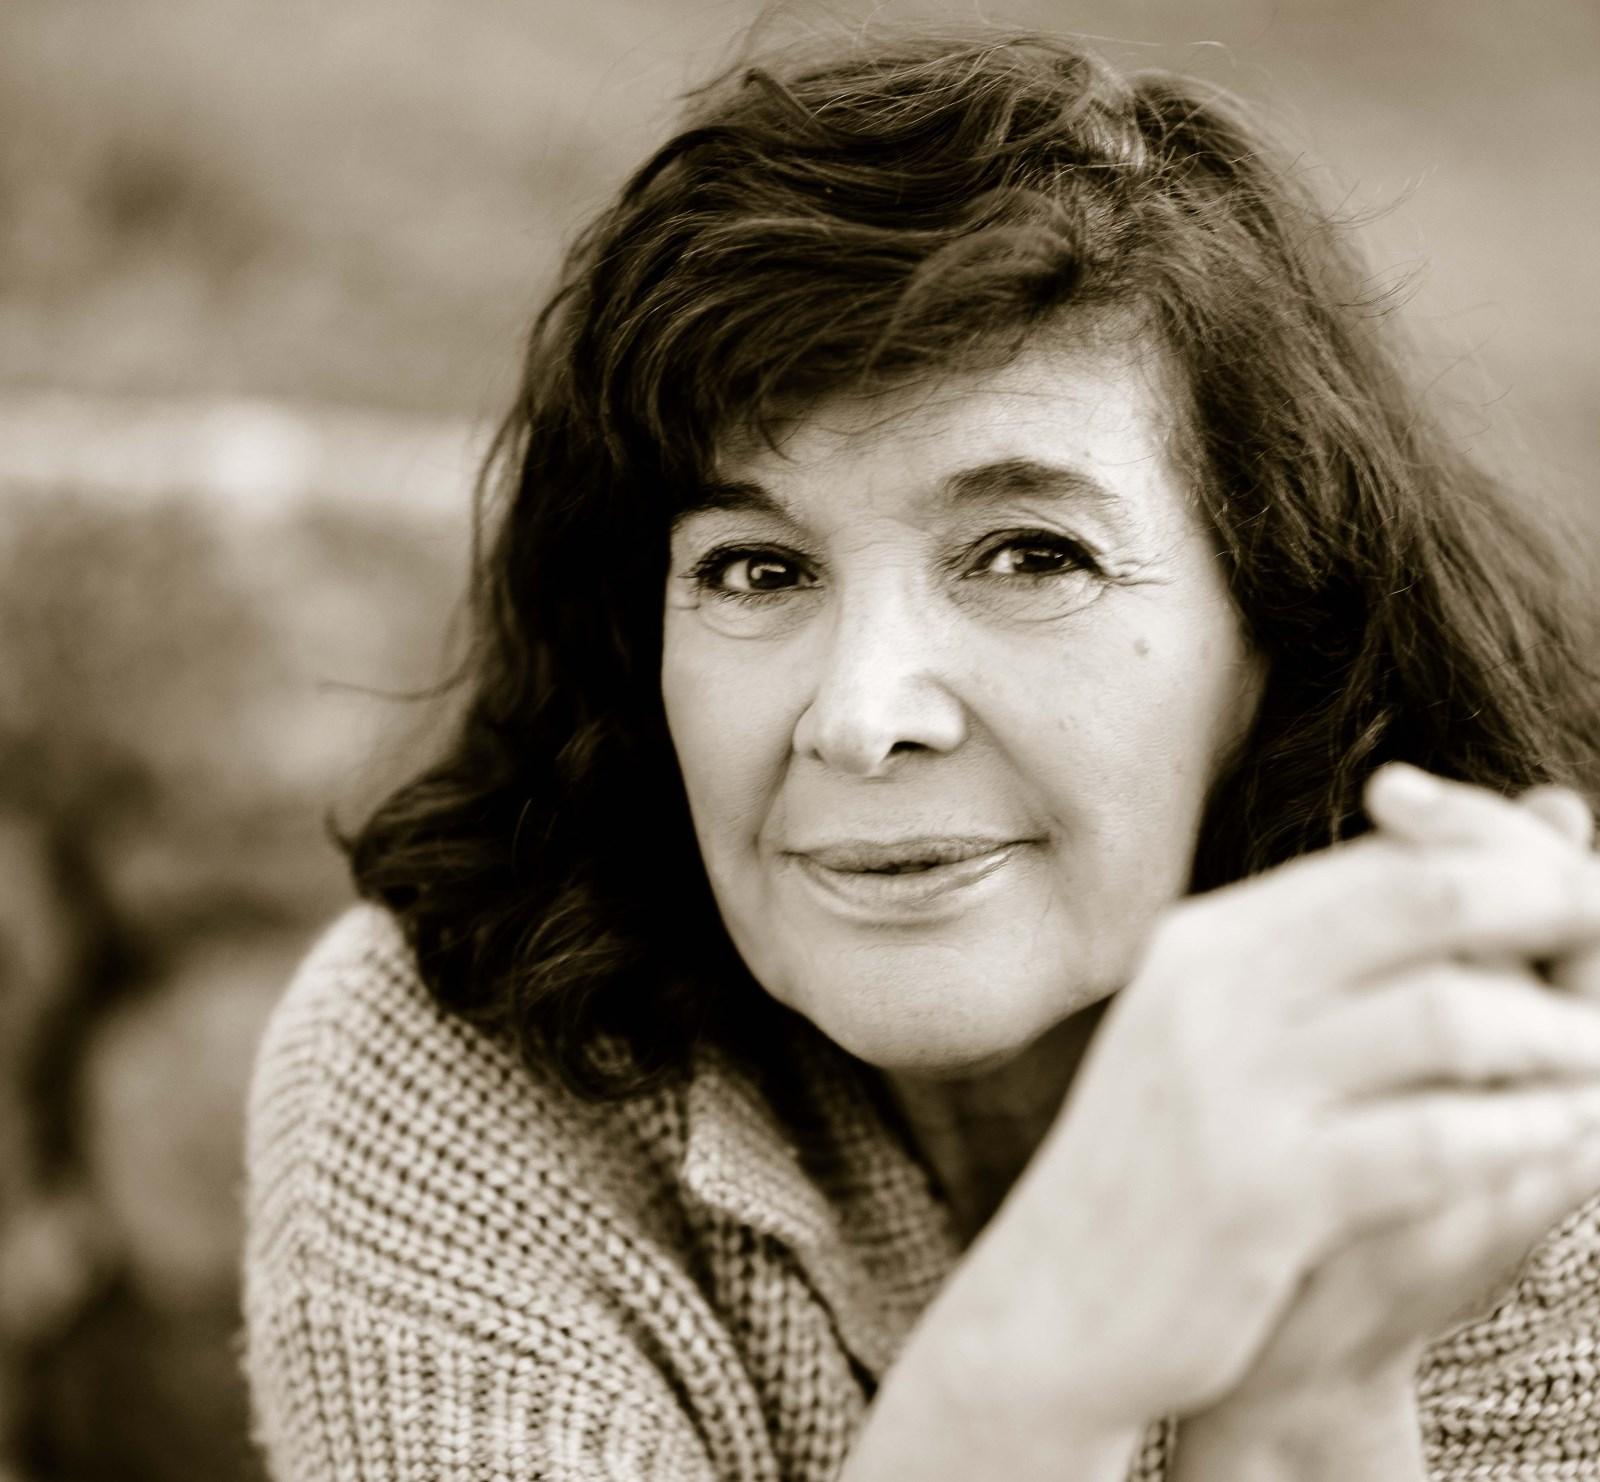 Prof. Pilar Muñoz Calero